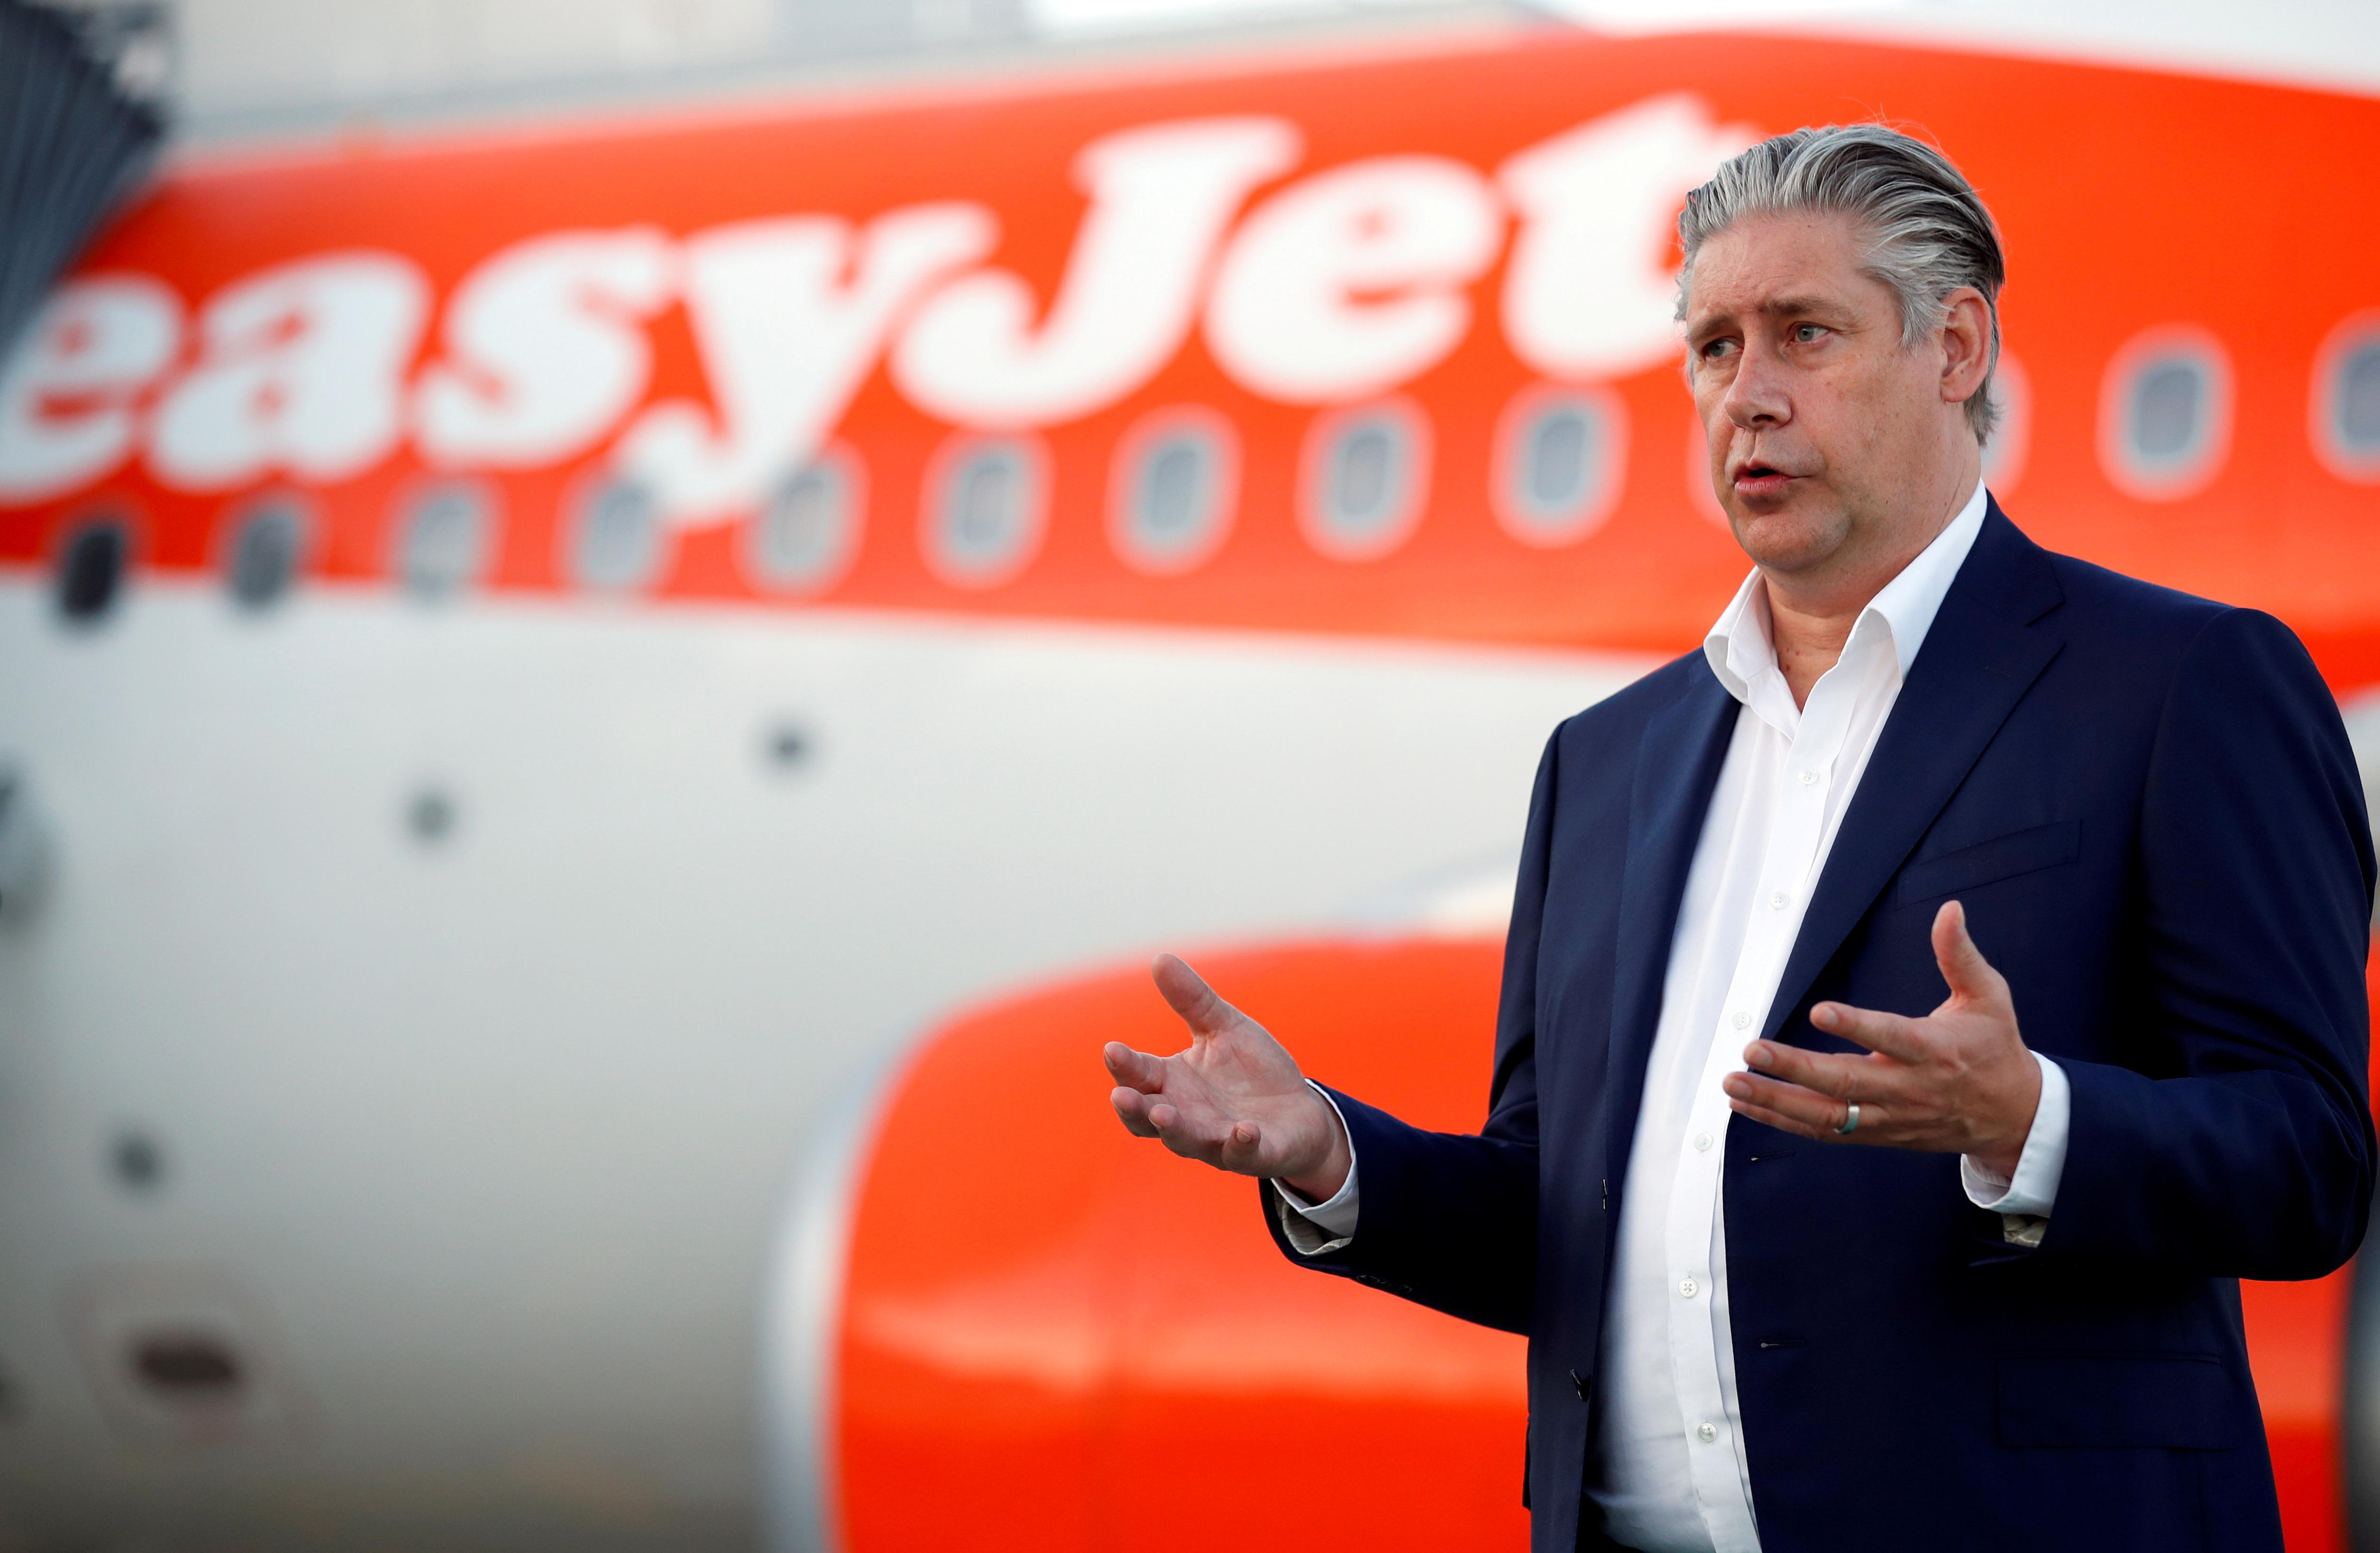 EasyJet CEO Johan Lundgren gestures as he talks to media at Gatwick Airport, Britain, June 15, 2020. REUTERS/Peter Cziborra